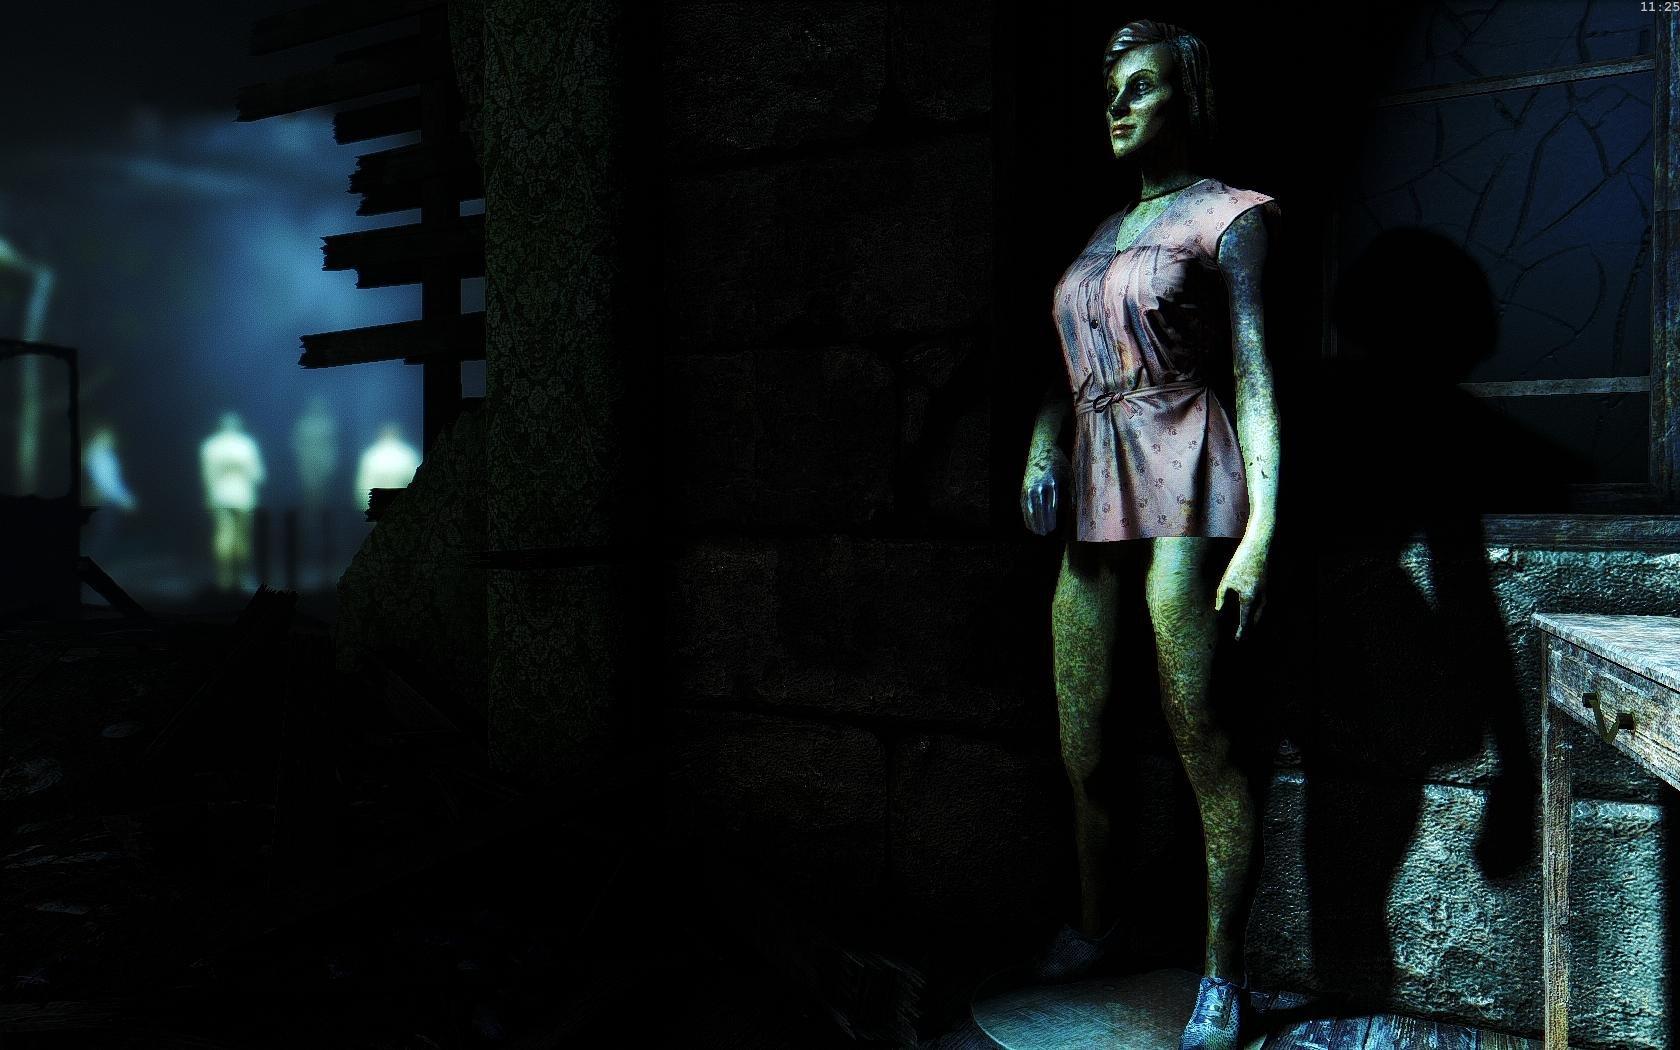 Fallout4 2019-01-07 11-25-23-30